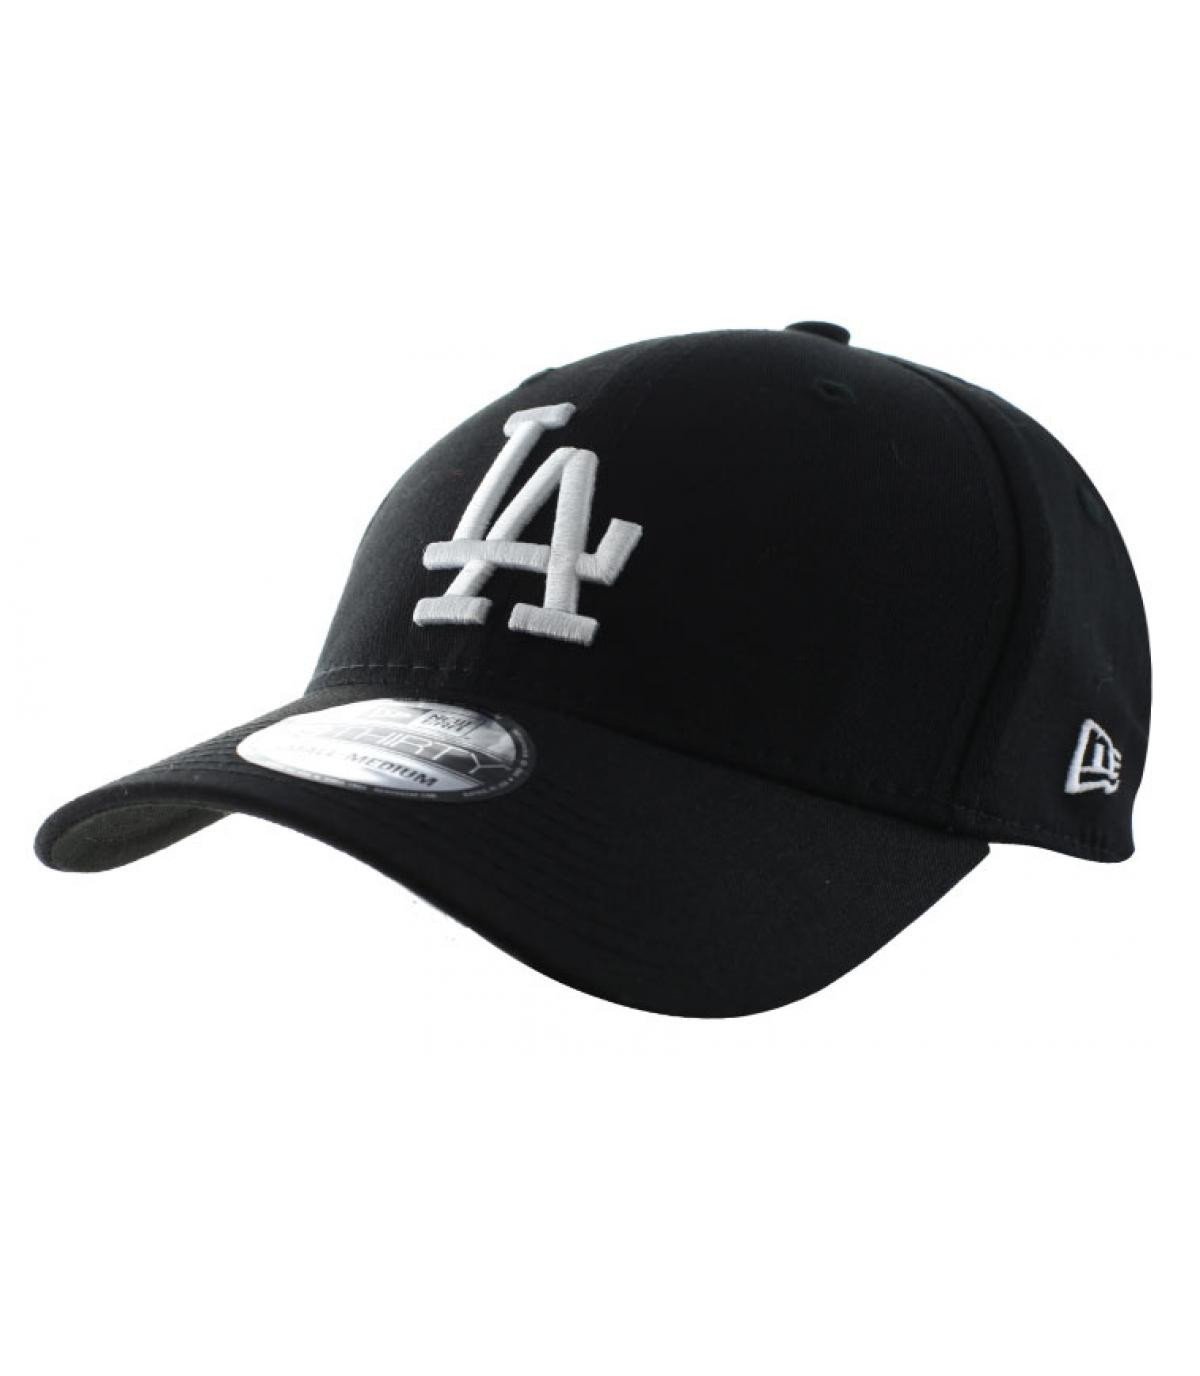 Black curved visor LA cap